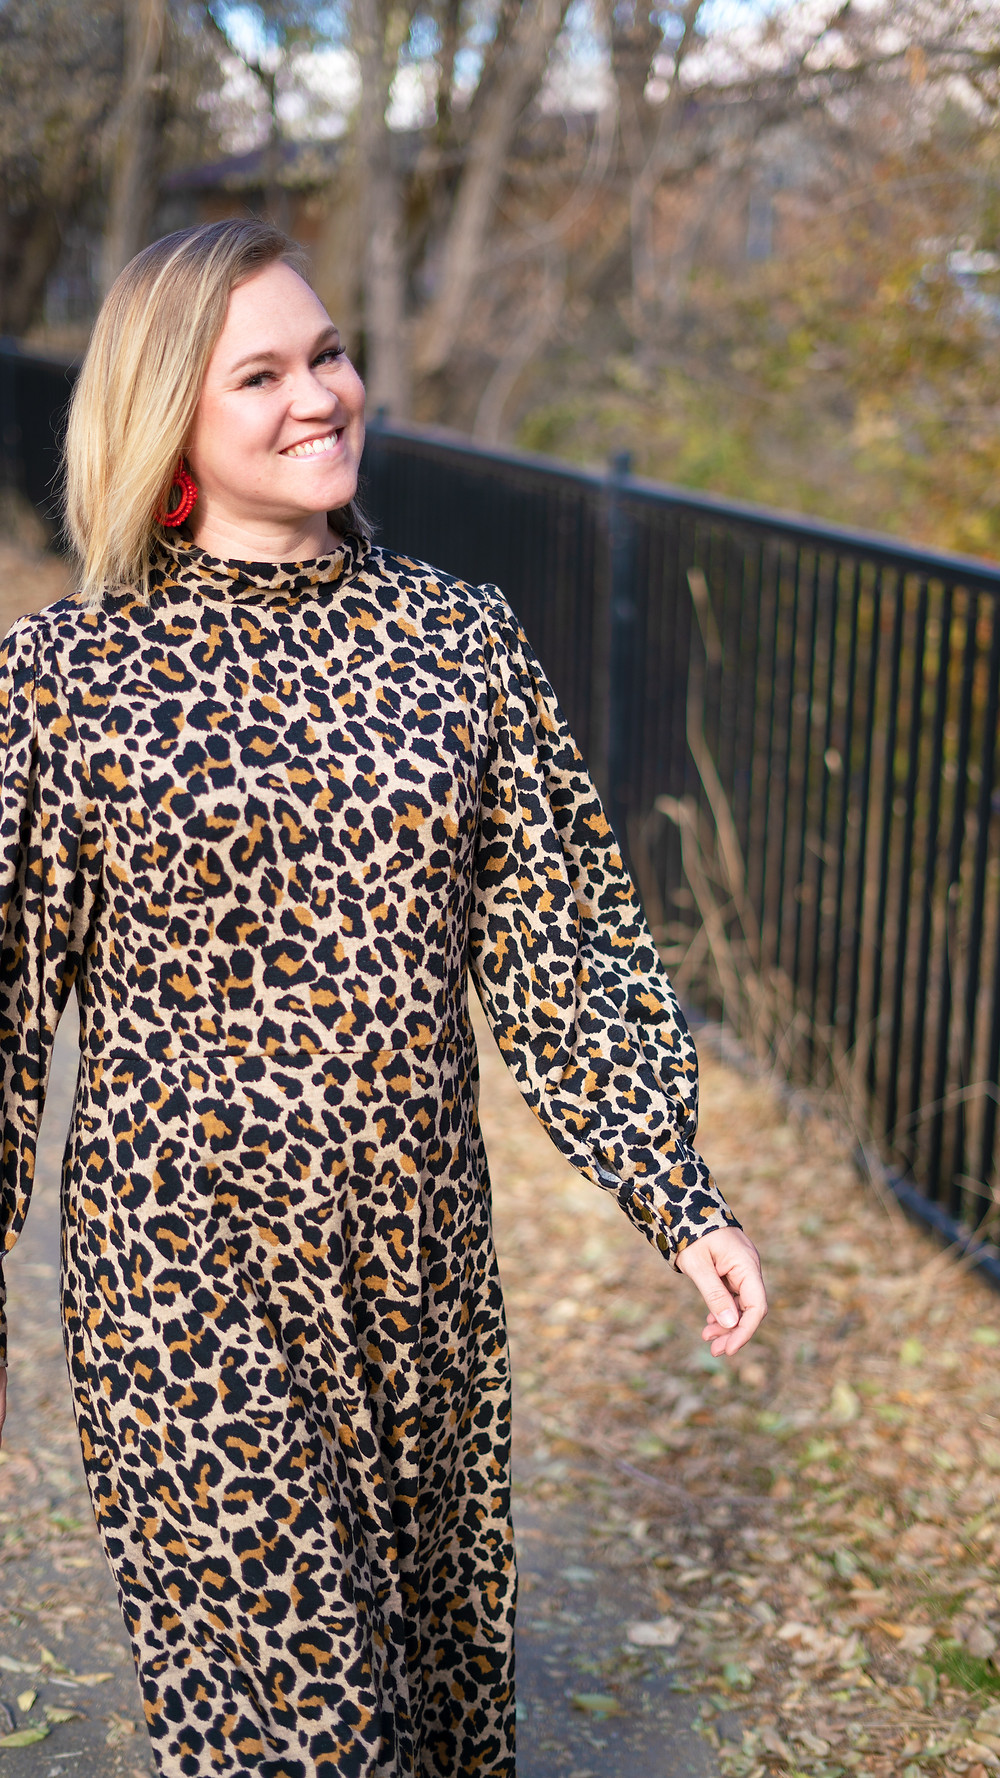 Vogue 1633 Leopard Sweater Dress Knit